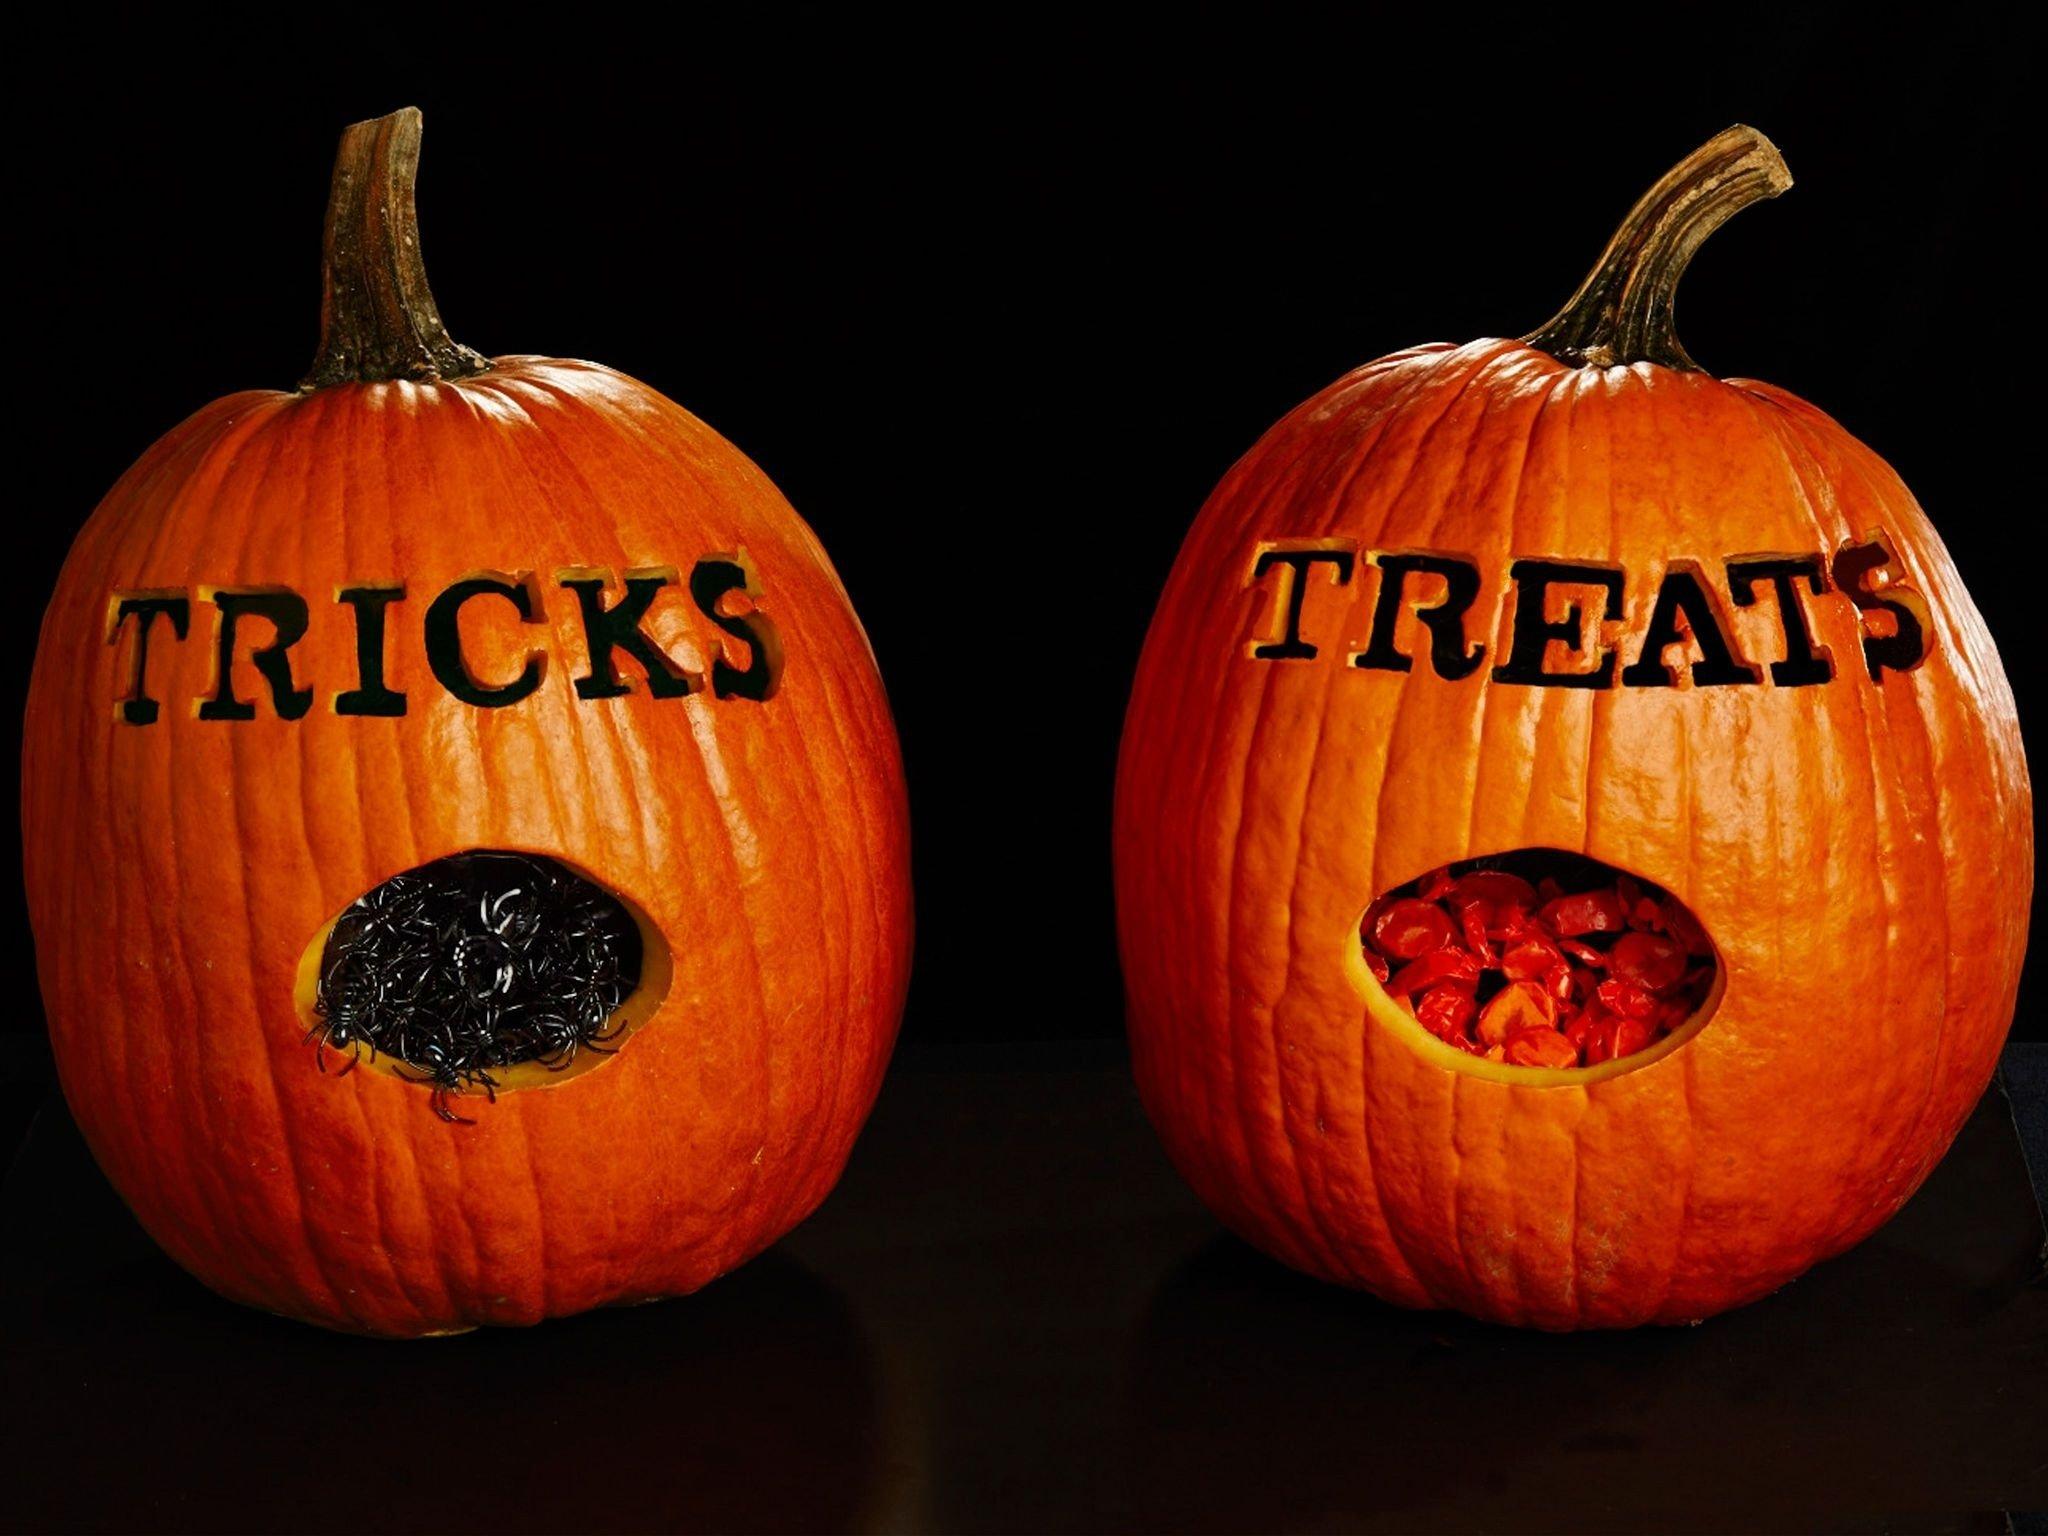 10 Wonderful Easy Cute Pumpkin Carving Ideas the best simple easy pumpkin carving ideas on cool for halloween 1 2021